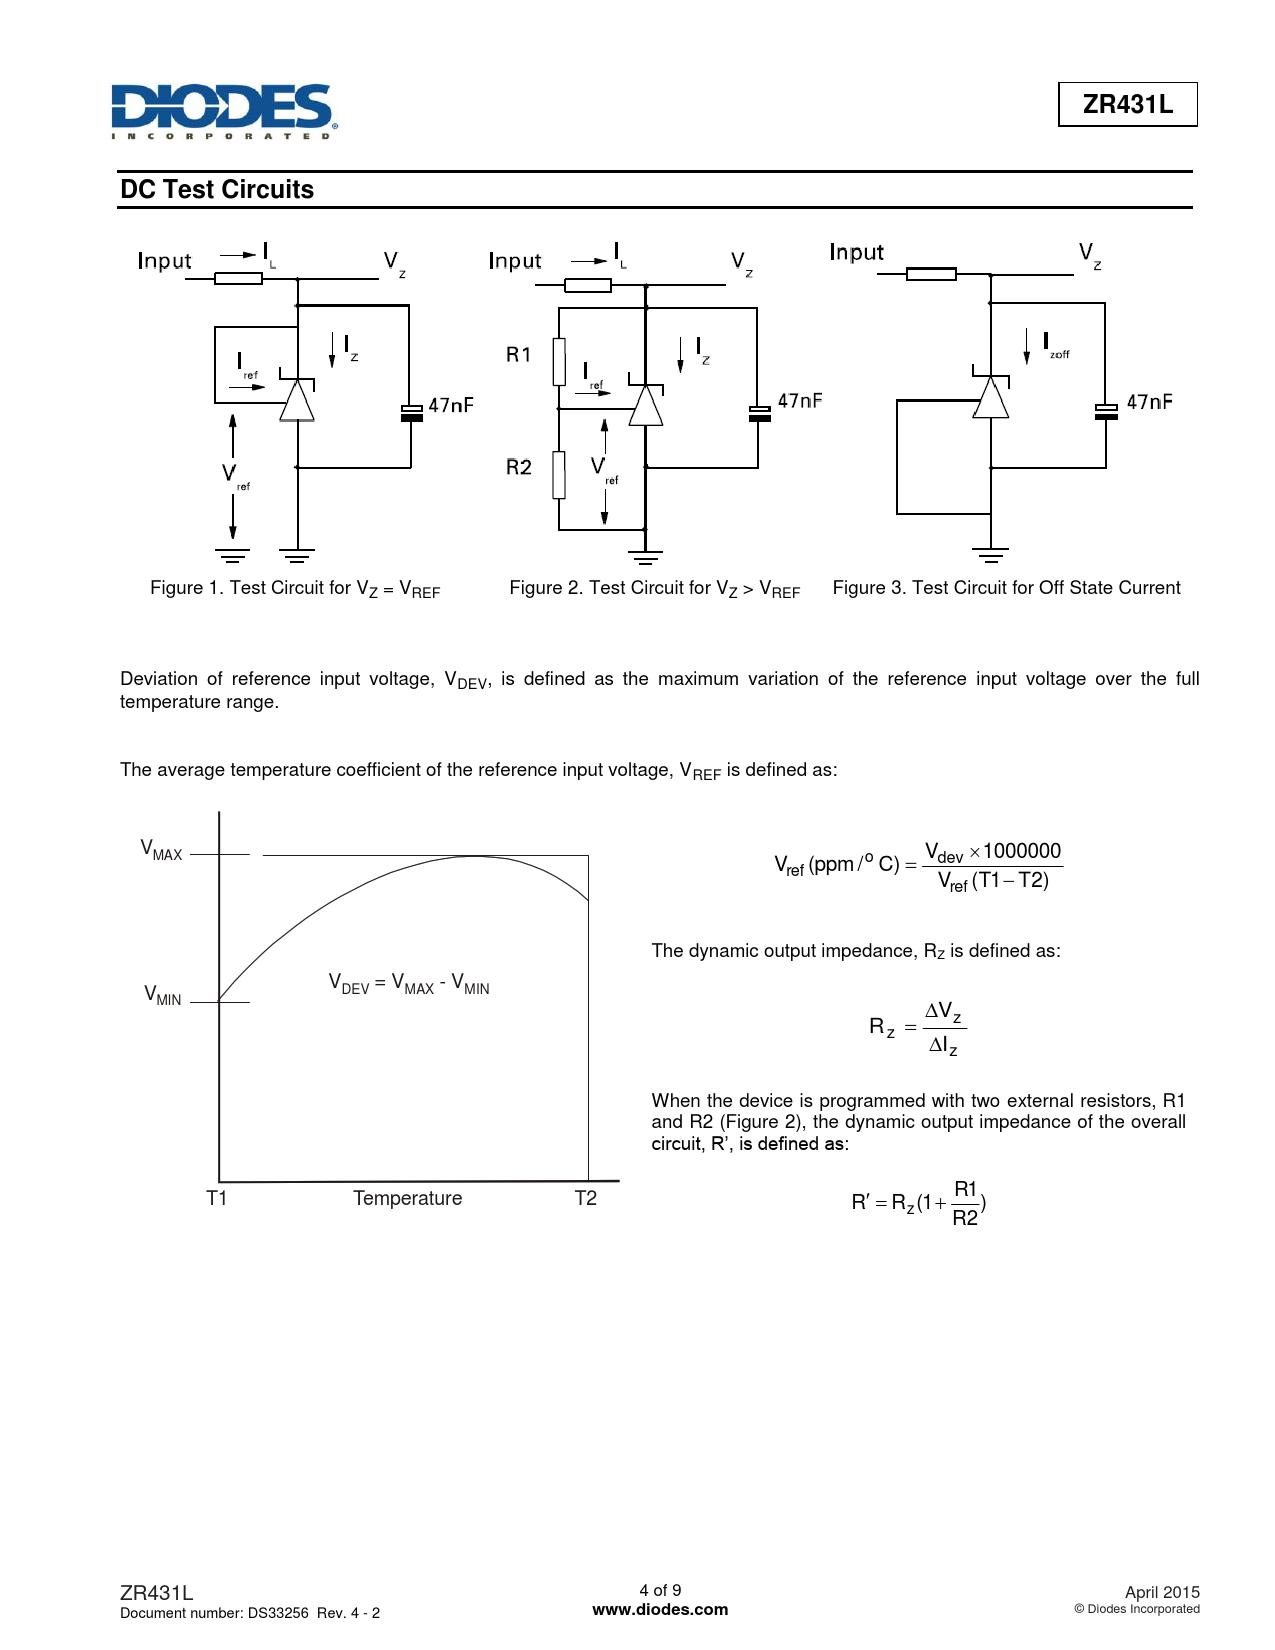 ZR431L DC Test Circuits www.diodes.com